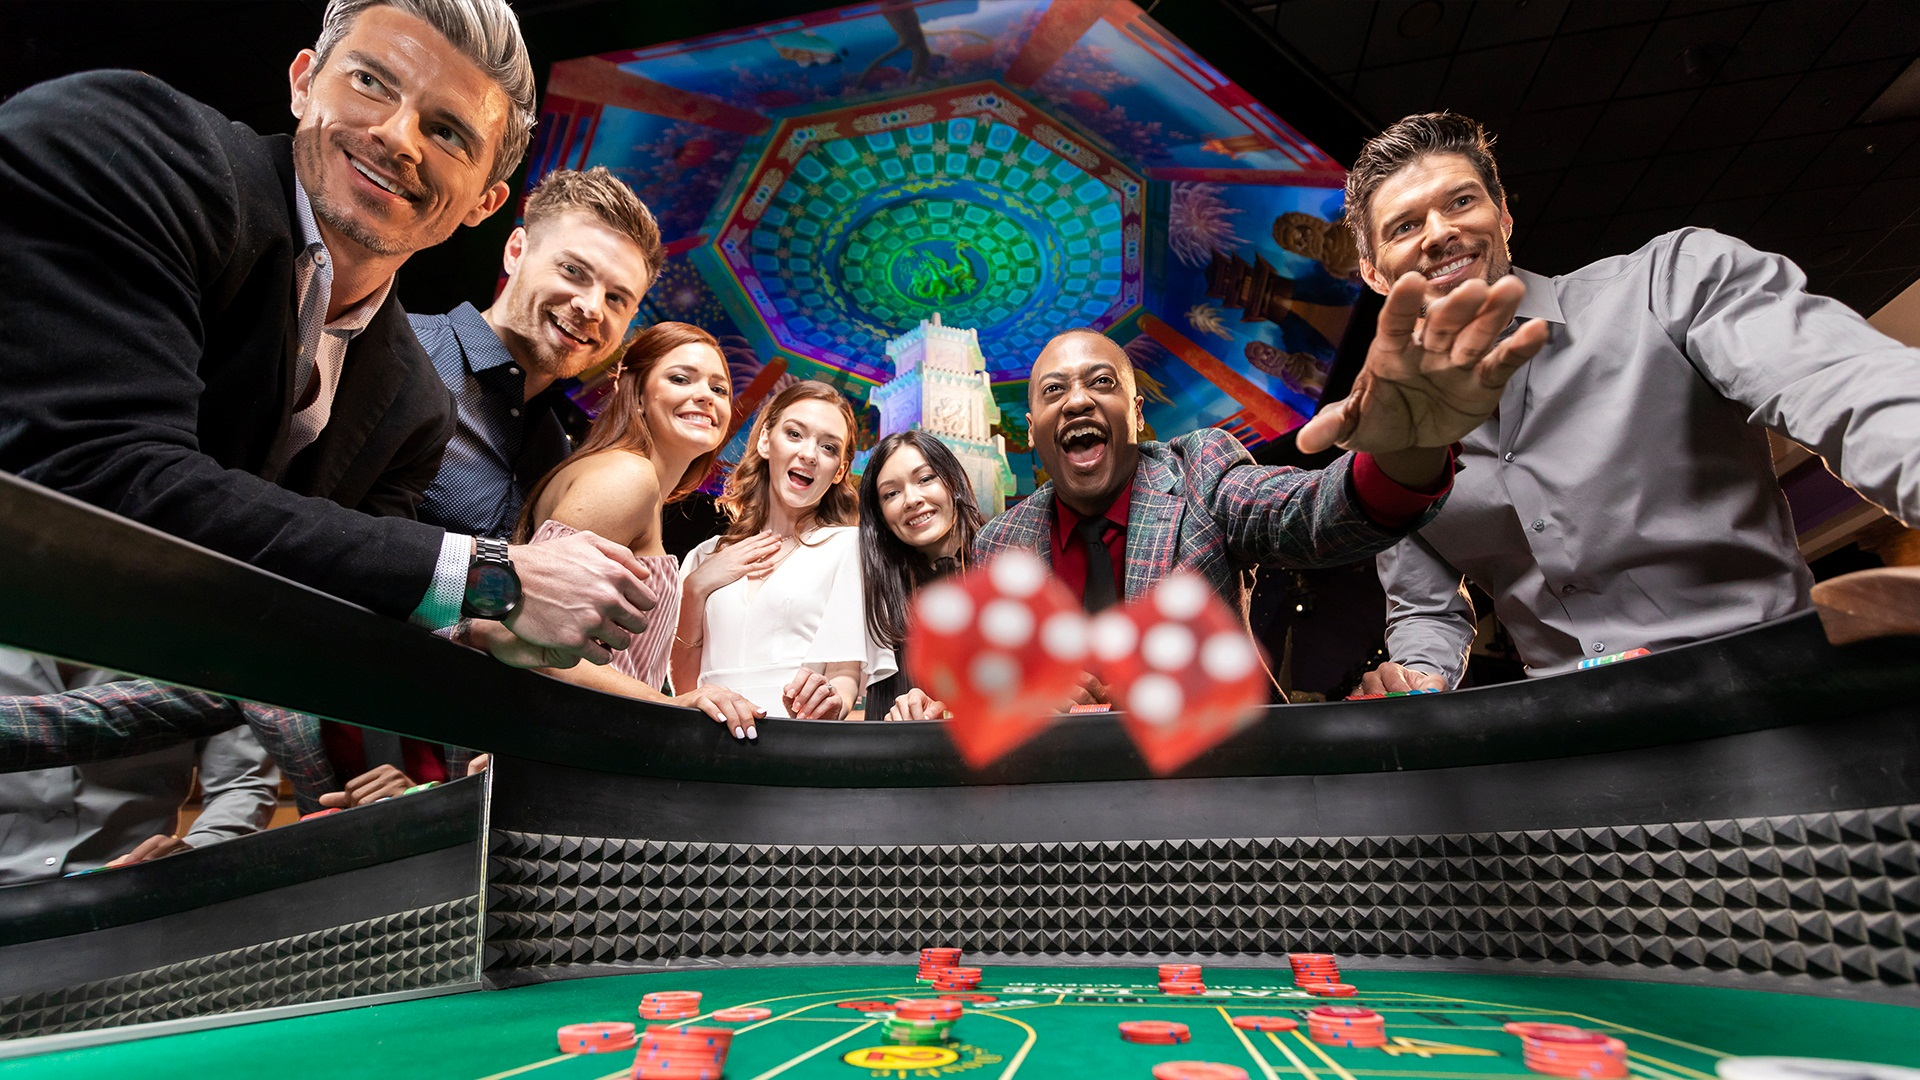 USA No Deposit Casinos